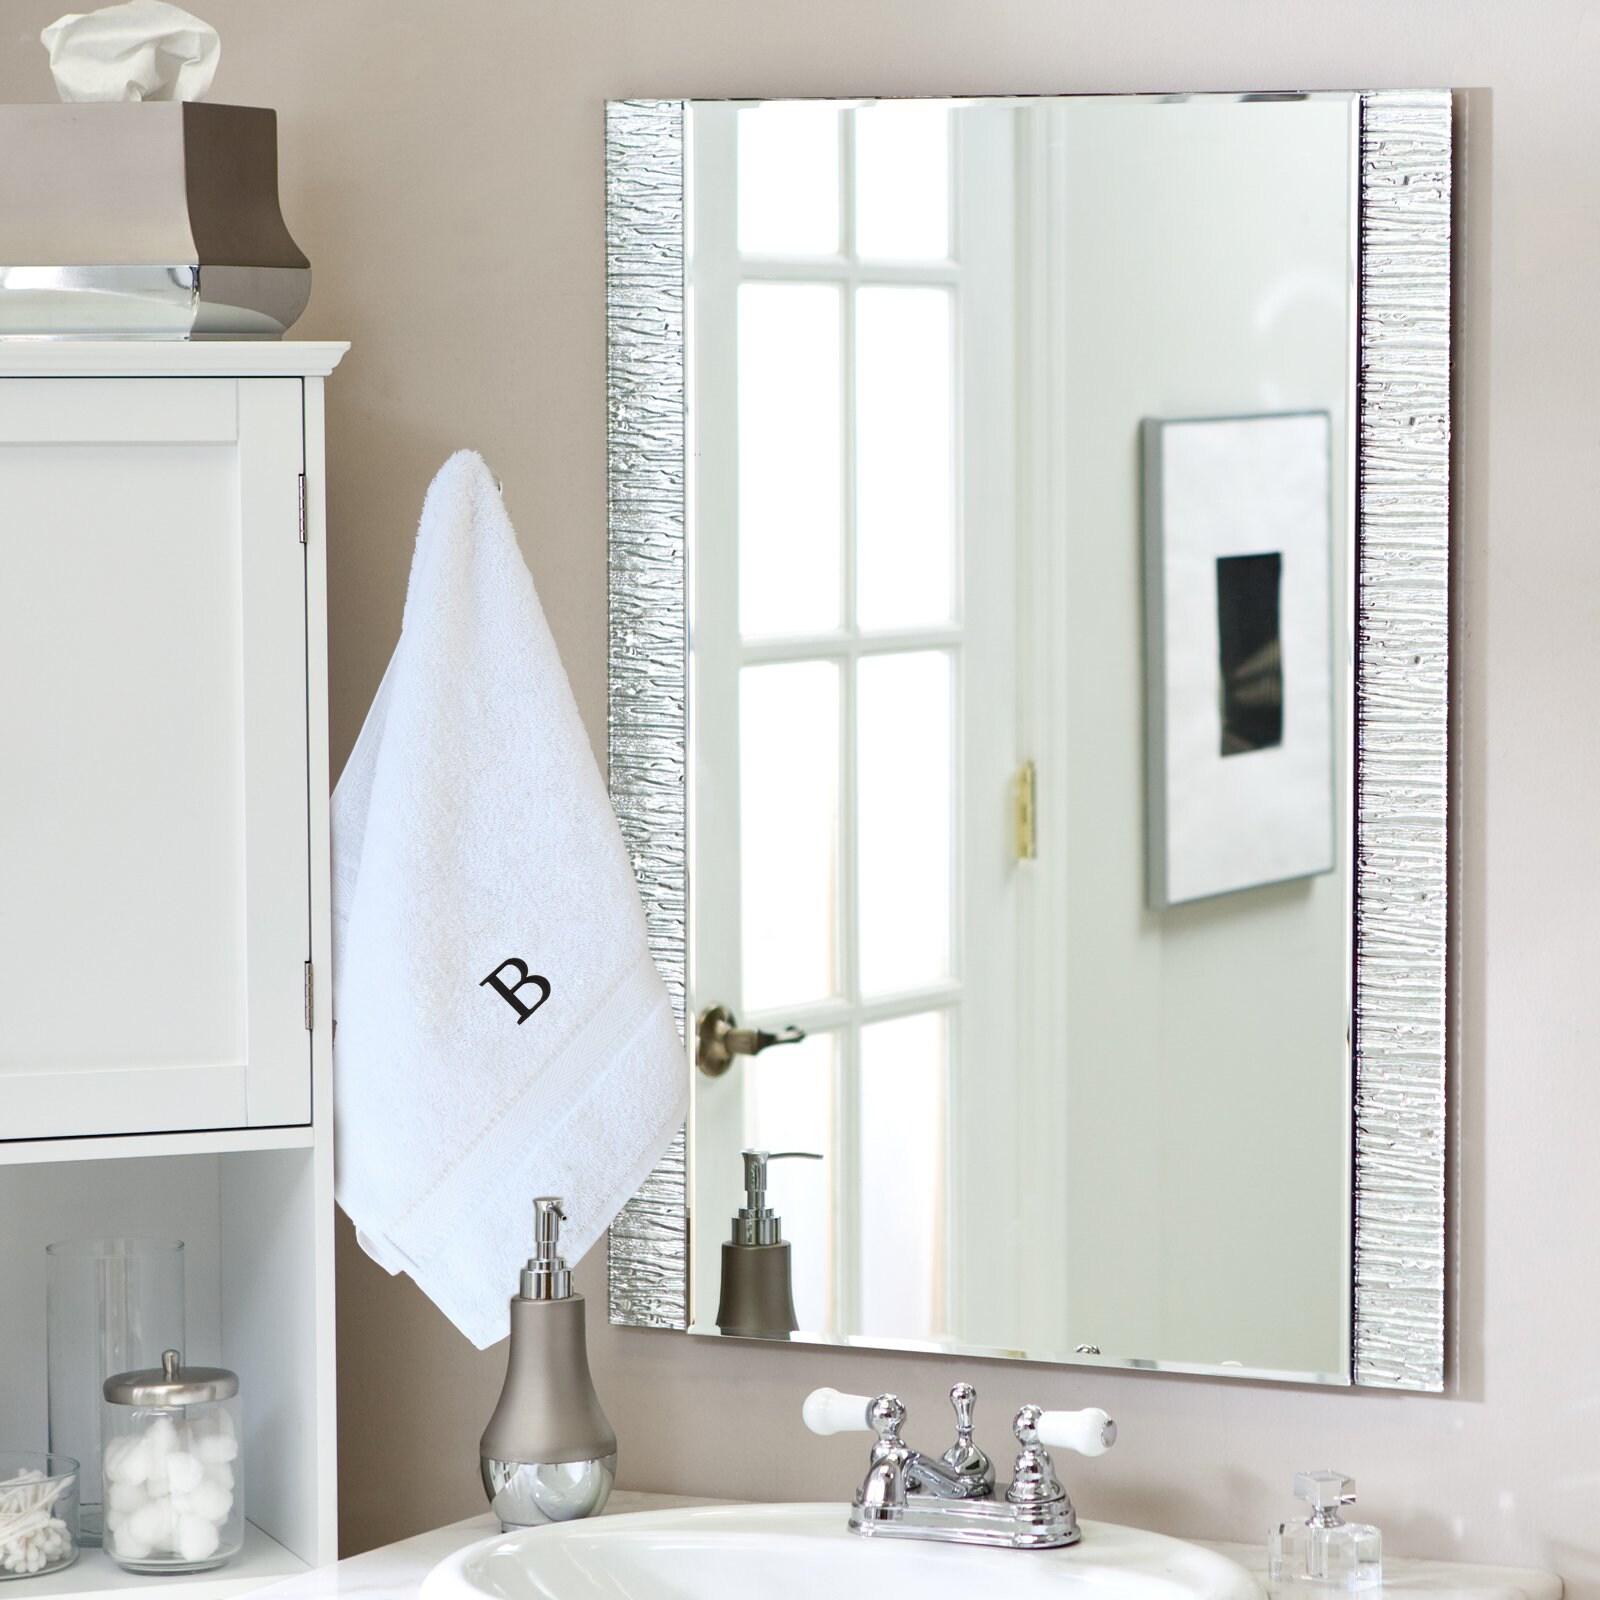 Shop Authentic Hotel and Spa 4-piece White Turkish Cotton Towel Set ...